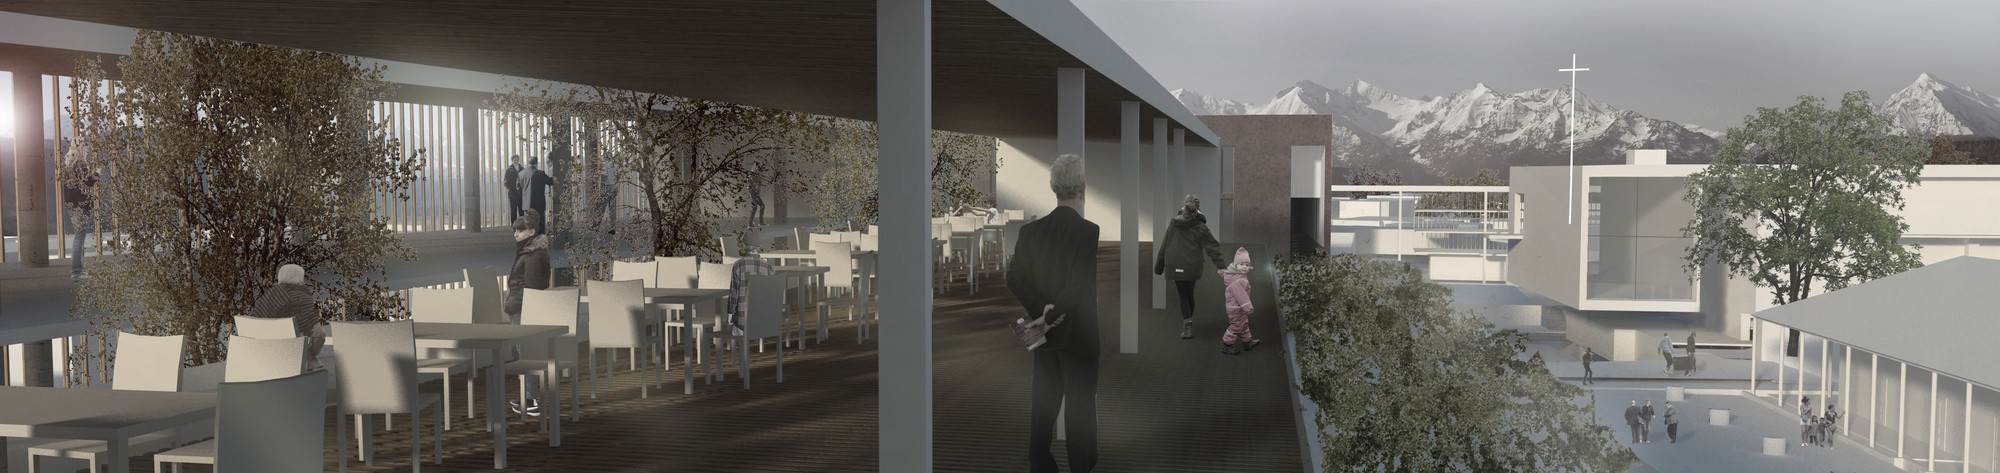 Terraza de talleres. Image Cortesia de Baixas & del Río Arquitectos